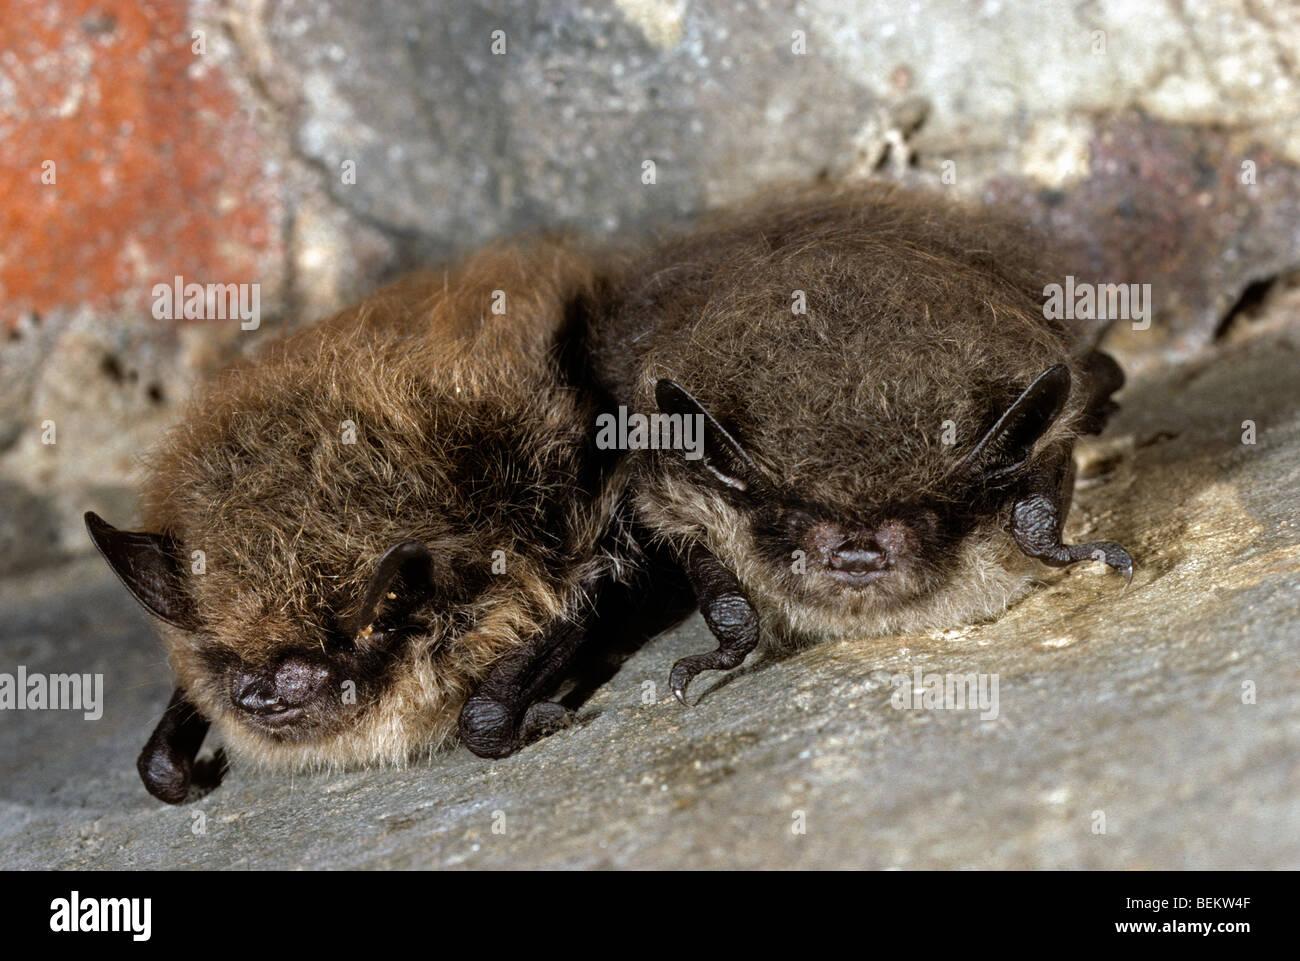 Two Whiskered bats (Myotis mystacinus) hibernating in cellar in winter - Stock Image